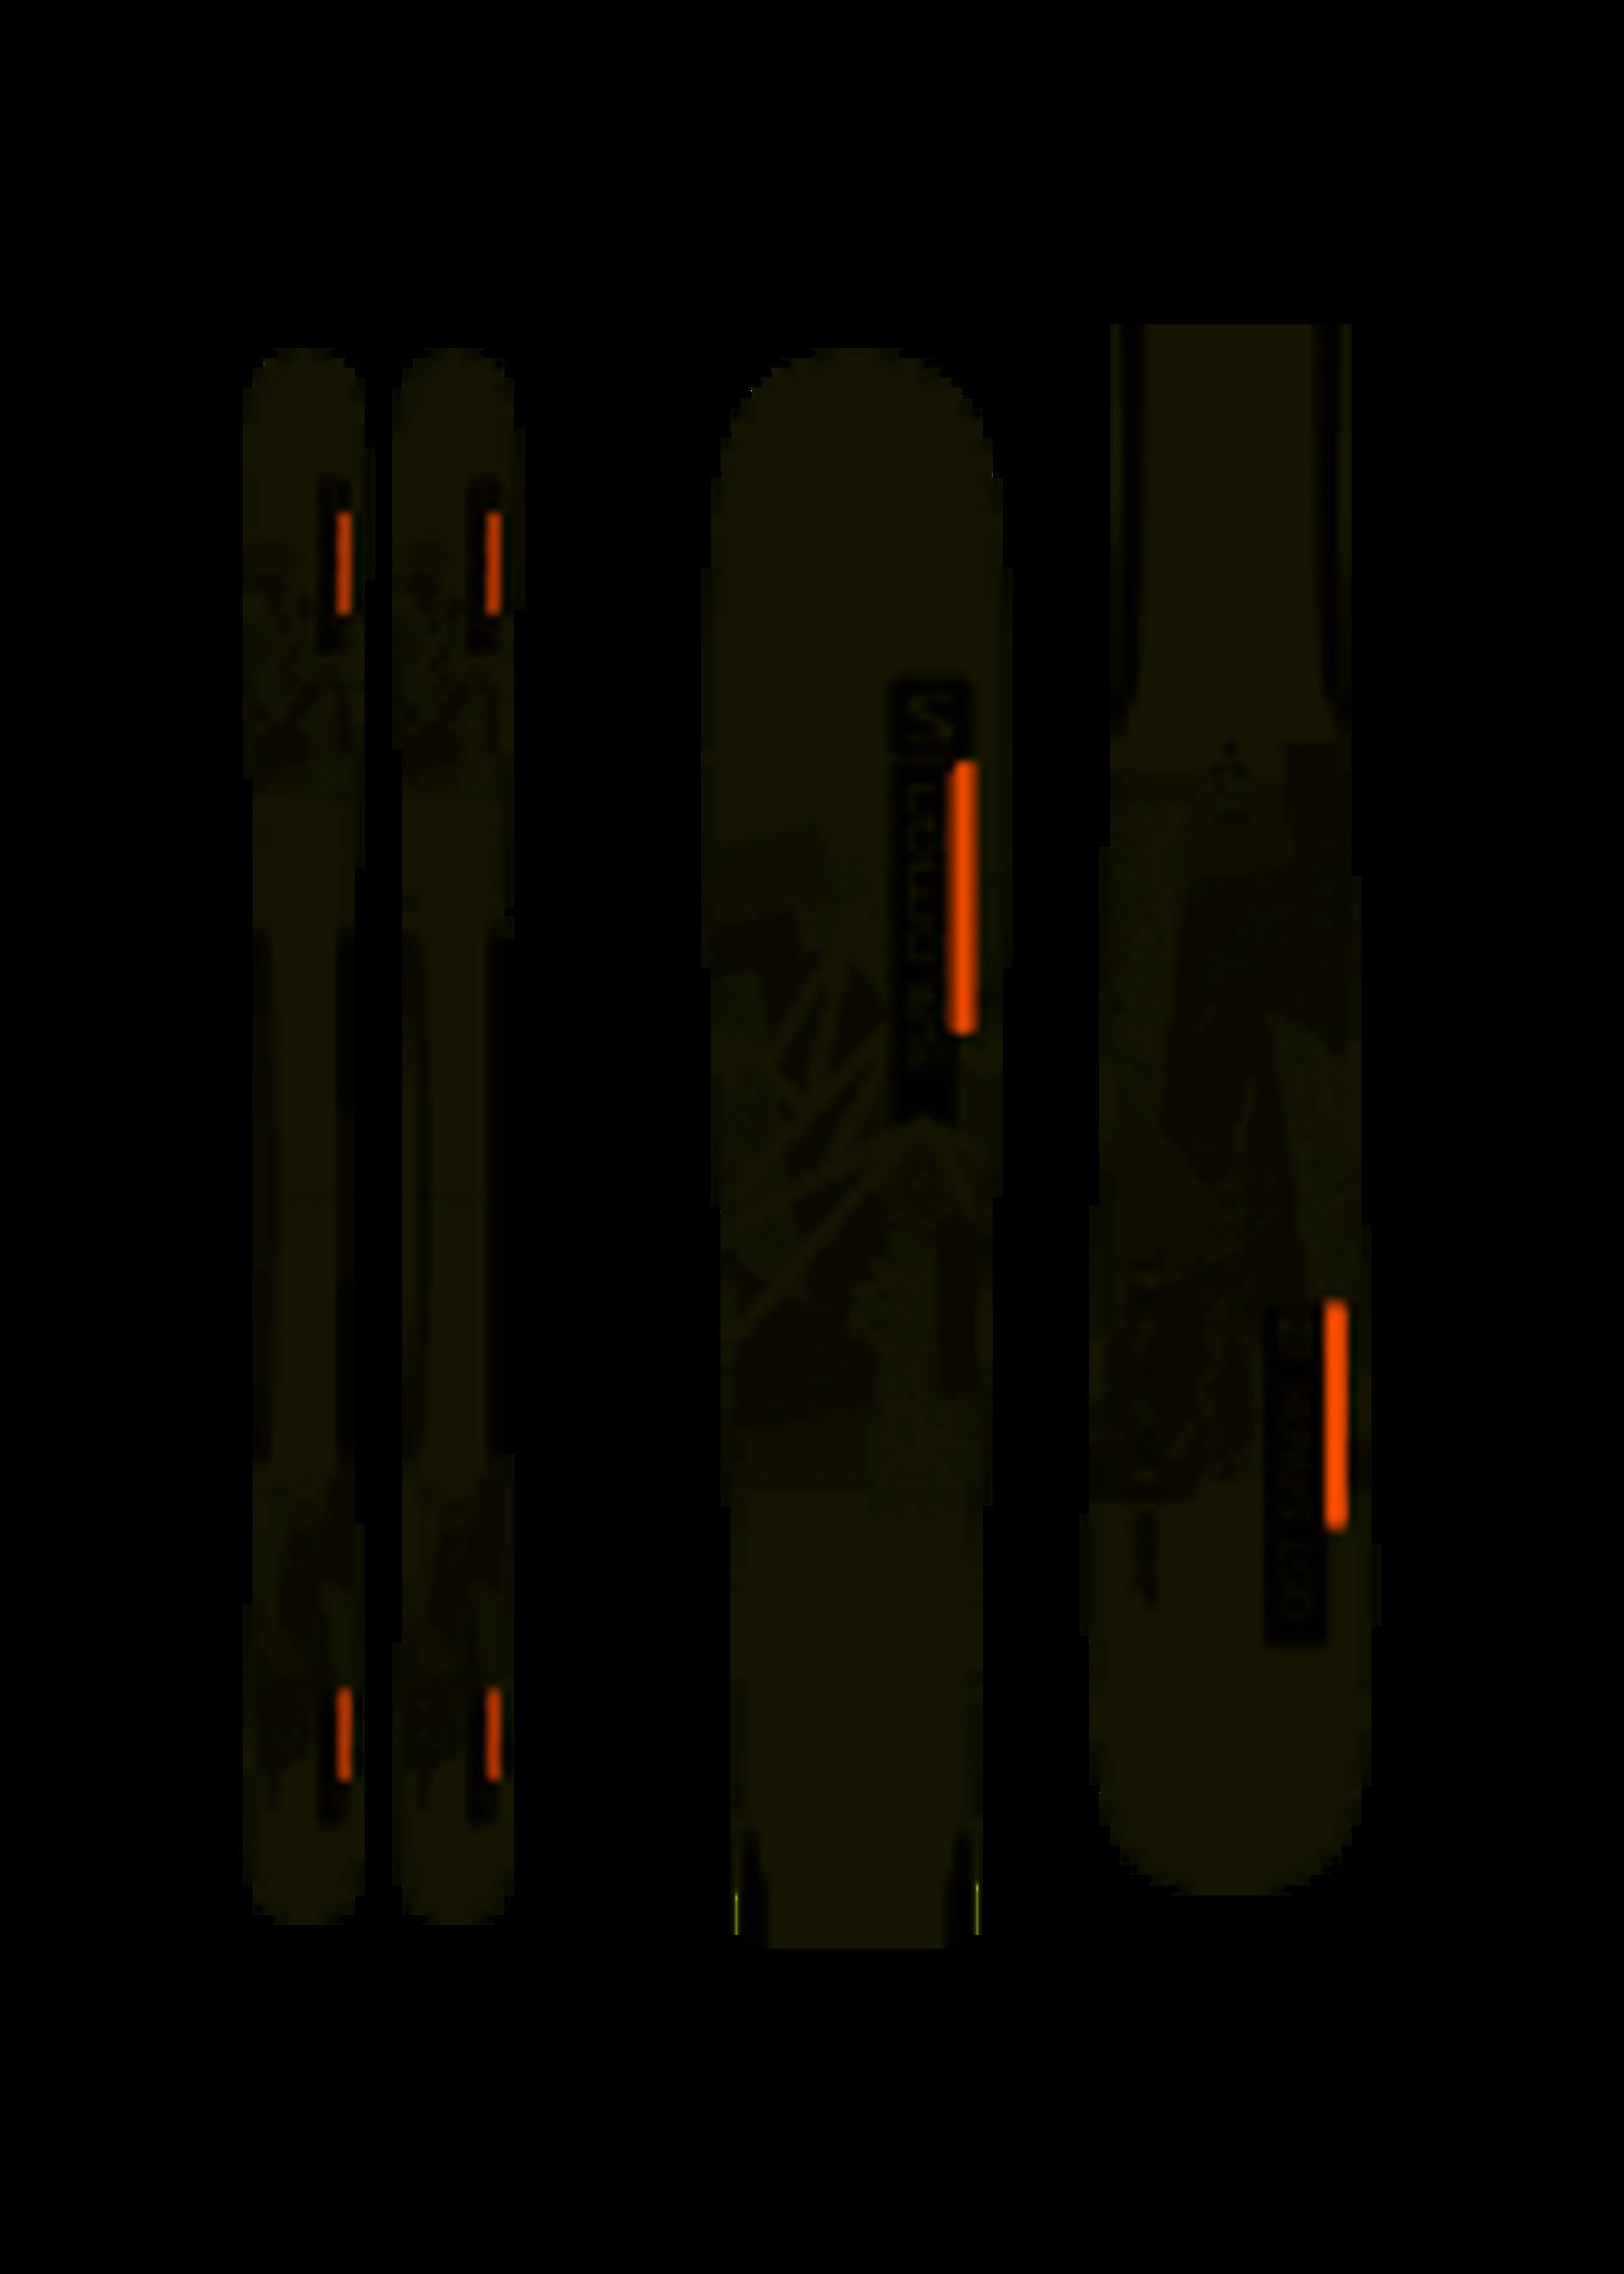 Salomon SKIS N QST SPARK Grey/Orange